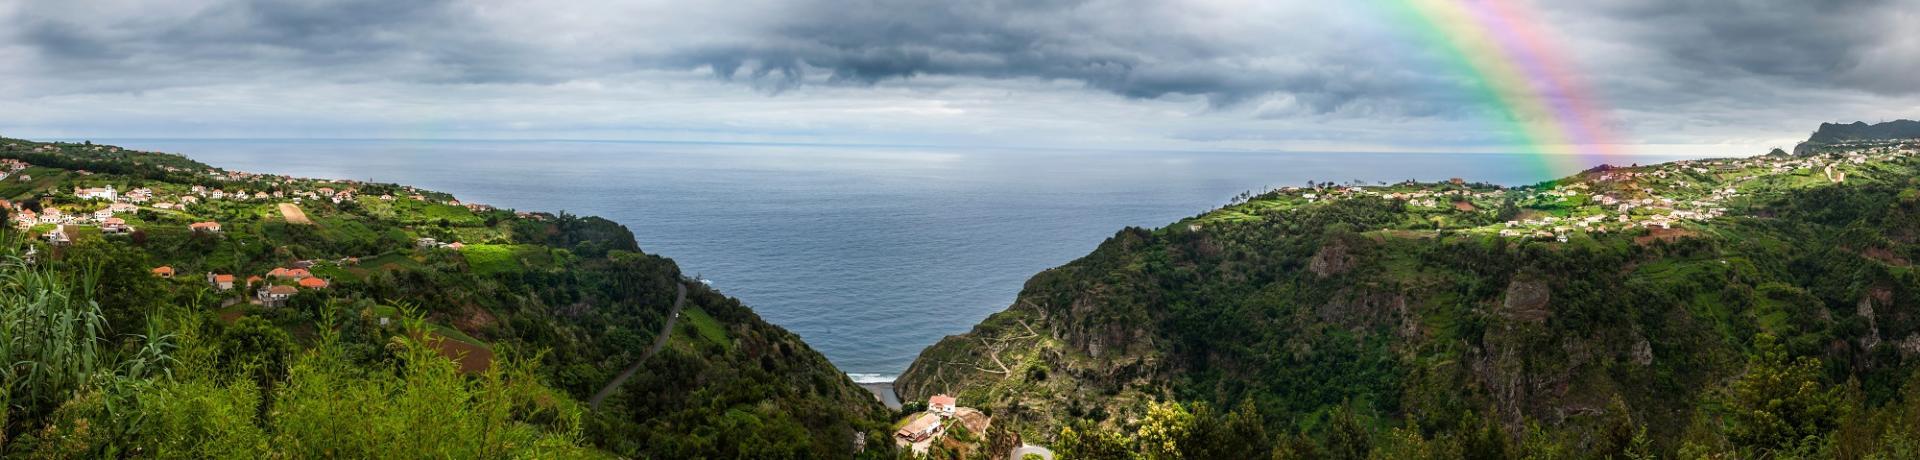 Madeira-Regenbogen-Emotion_GI-501888829.jpg